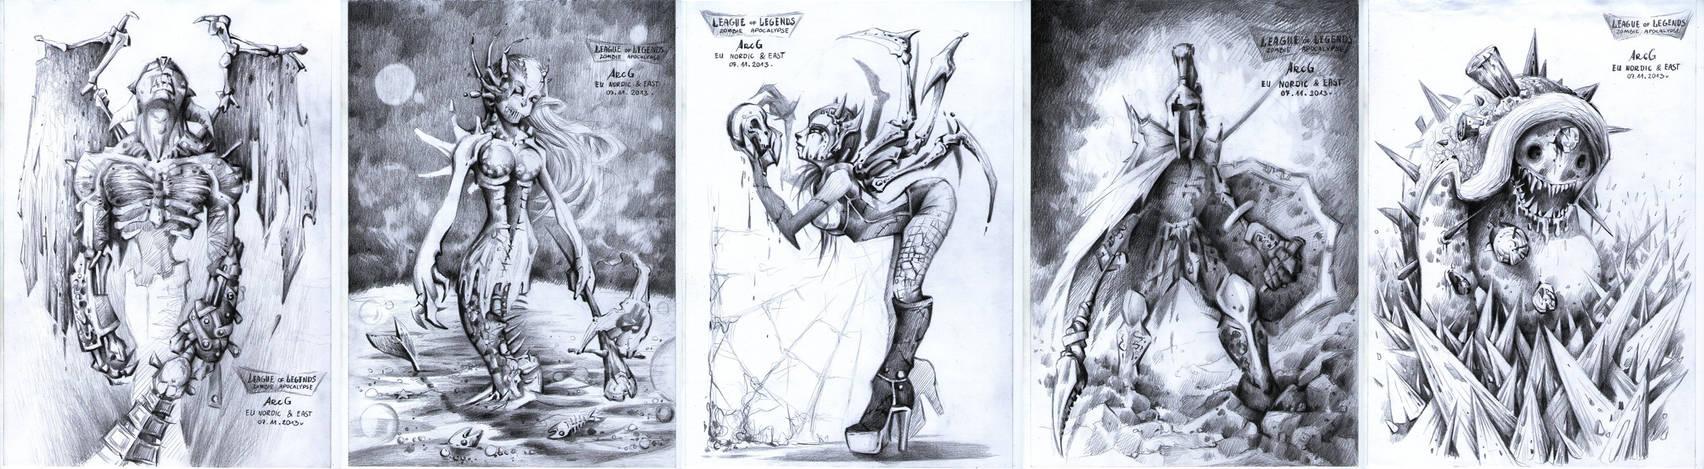 Zombie Contest- Harrowing 2013- League of Legends